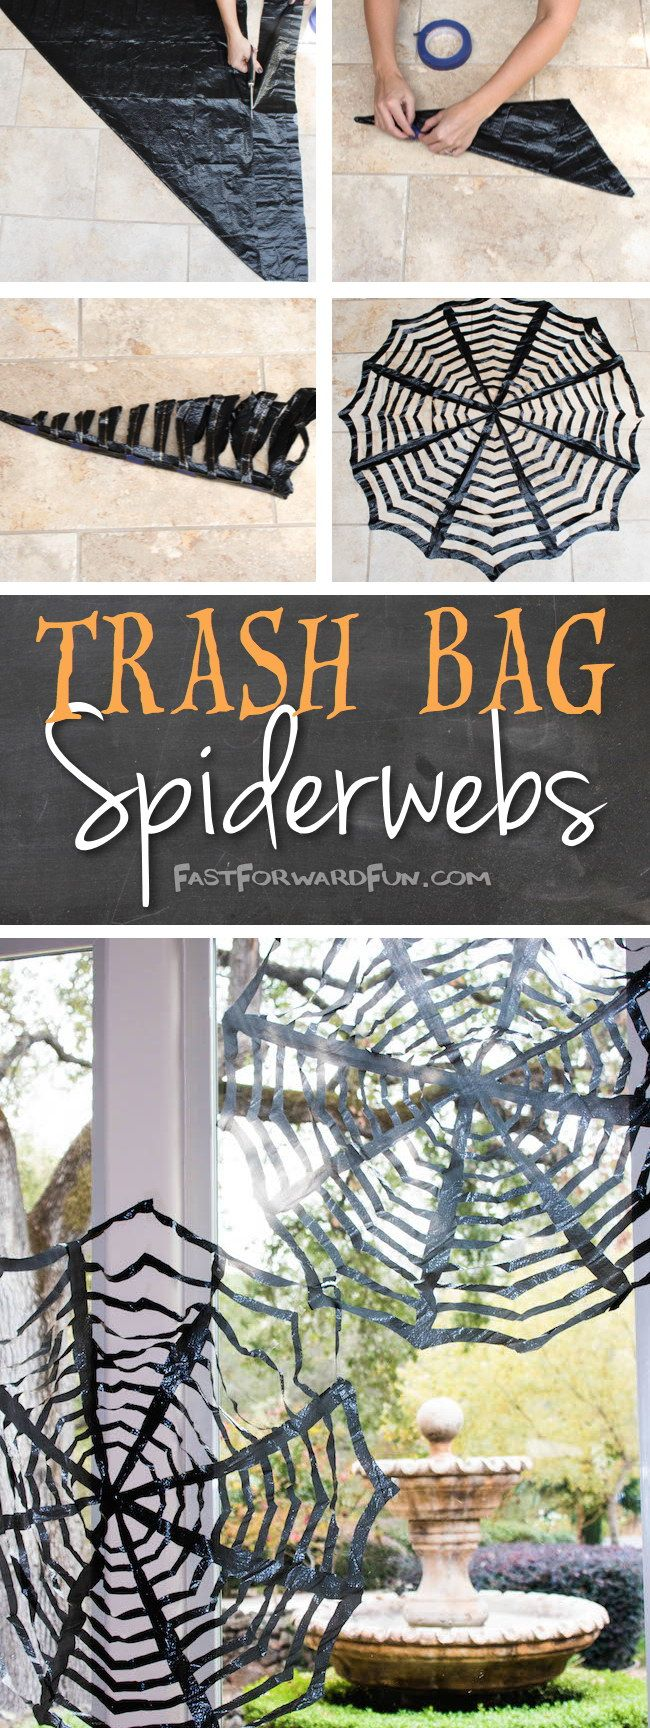 Easy DIY Trash Bag Spiderwebs.